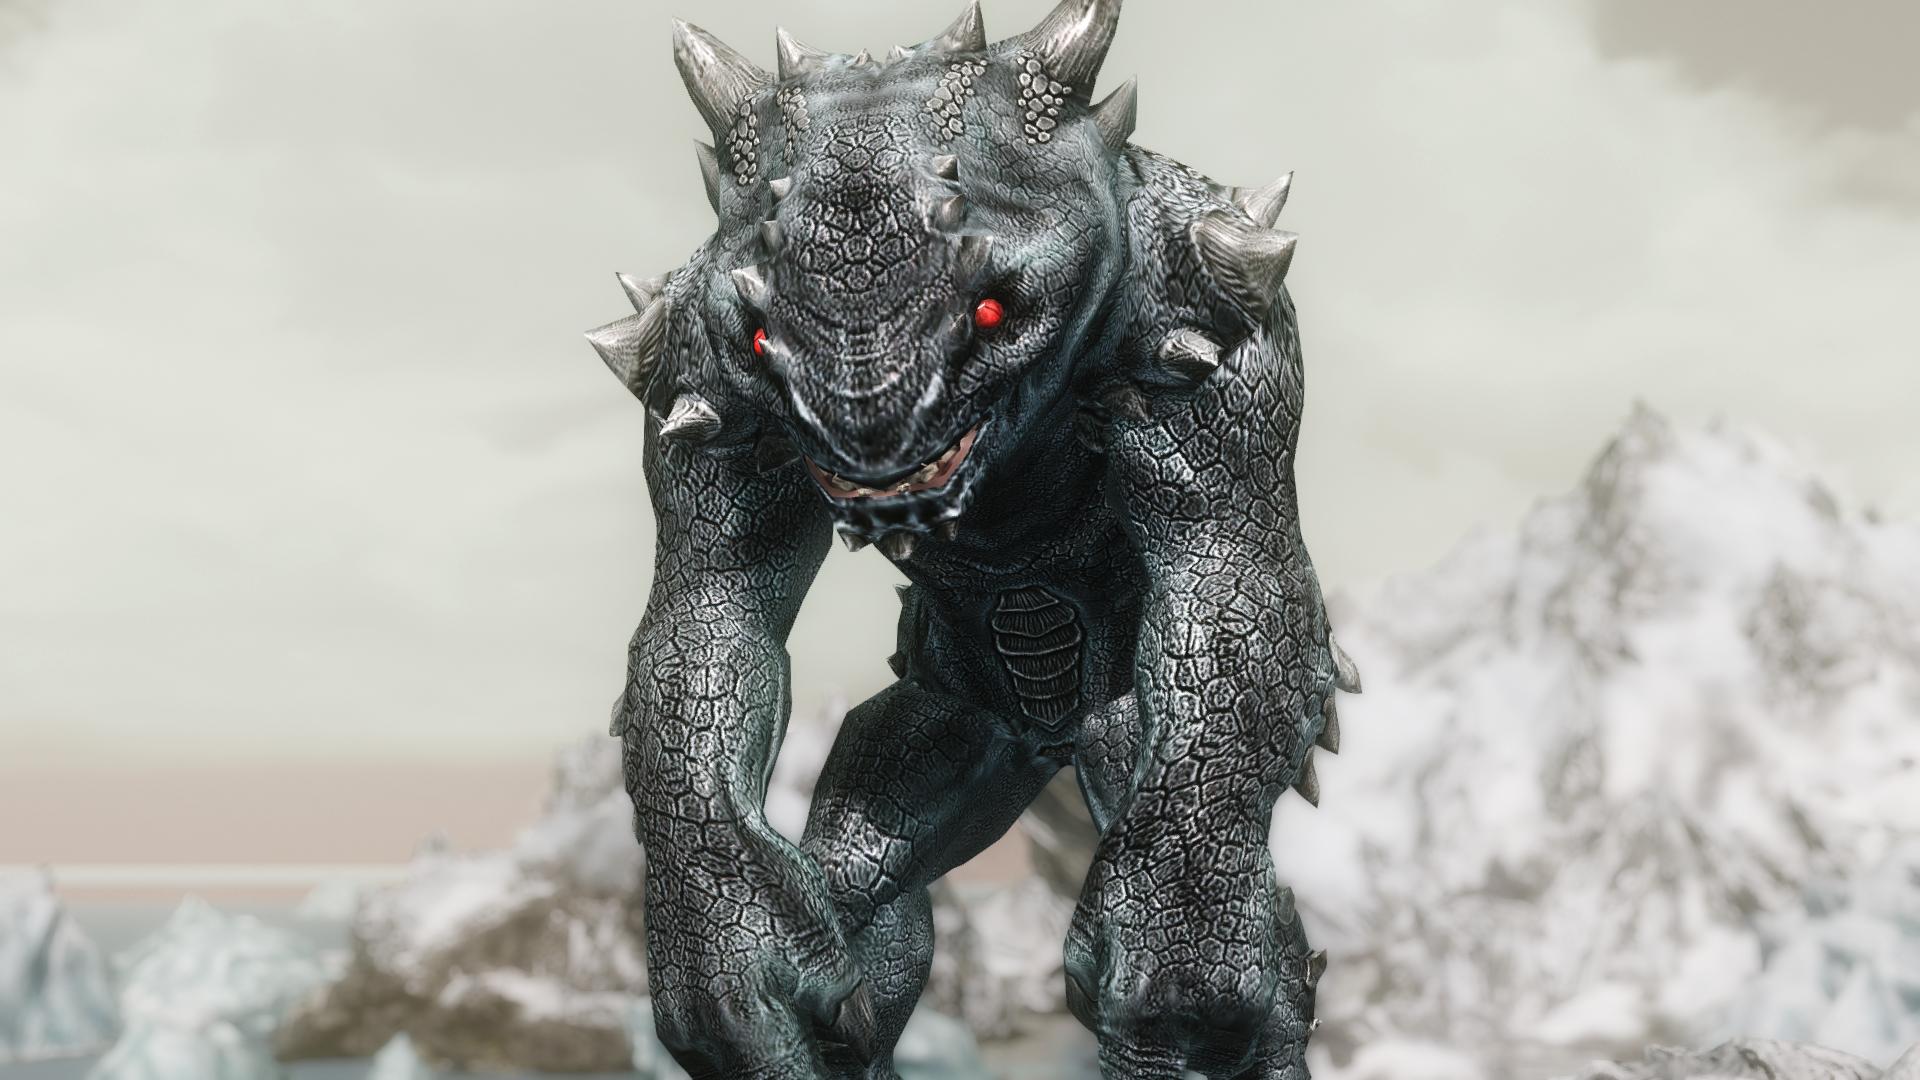 Gehenoth